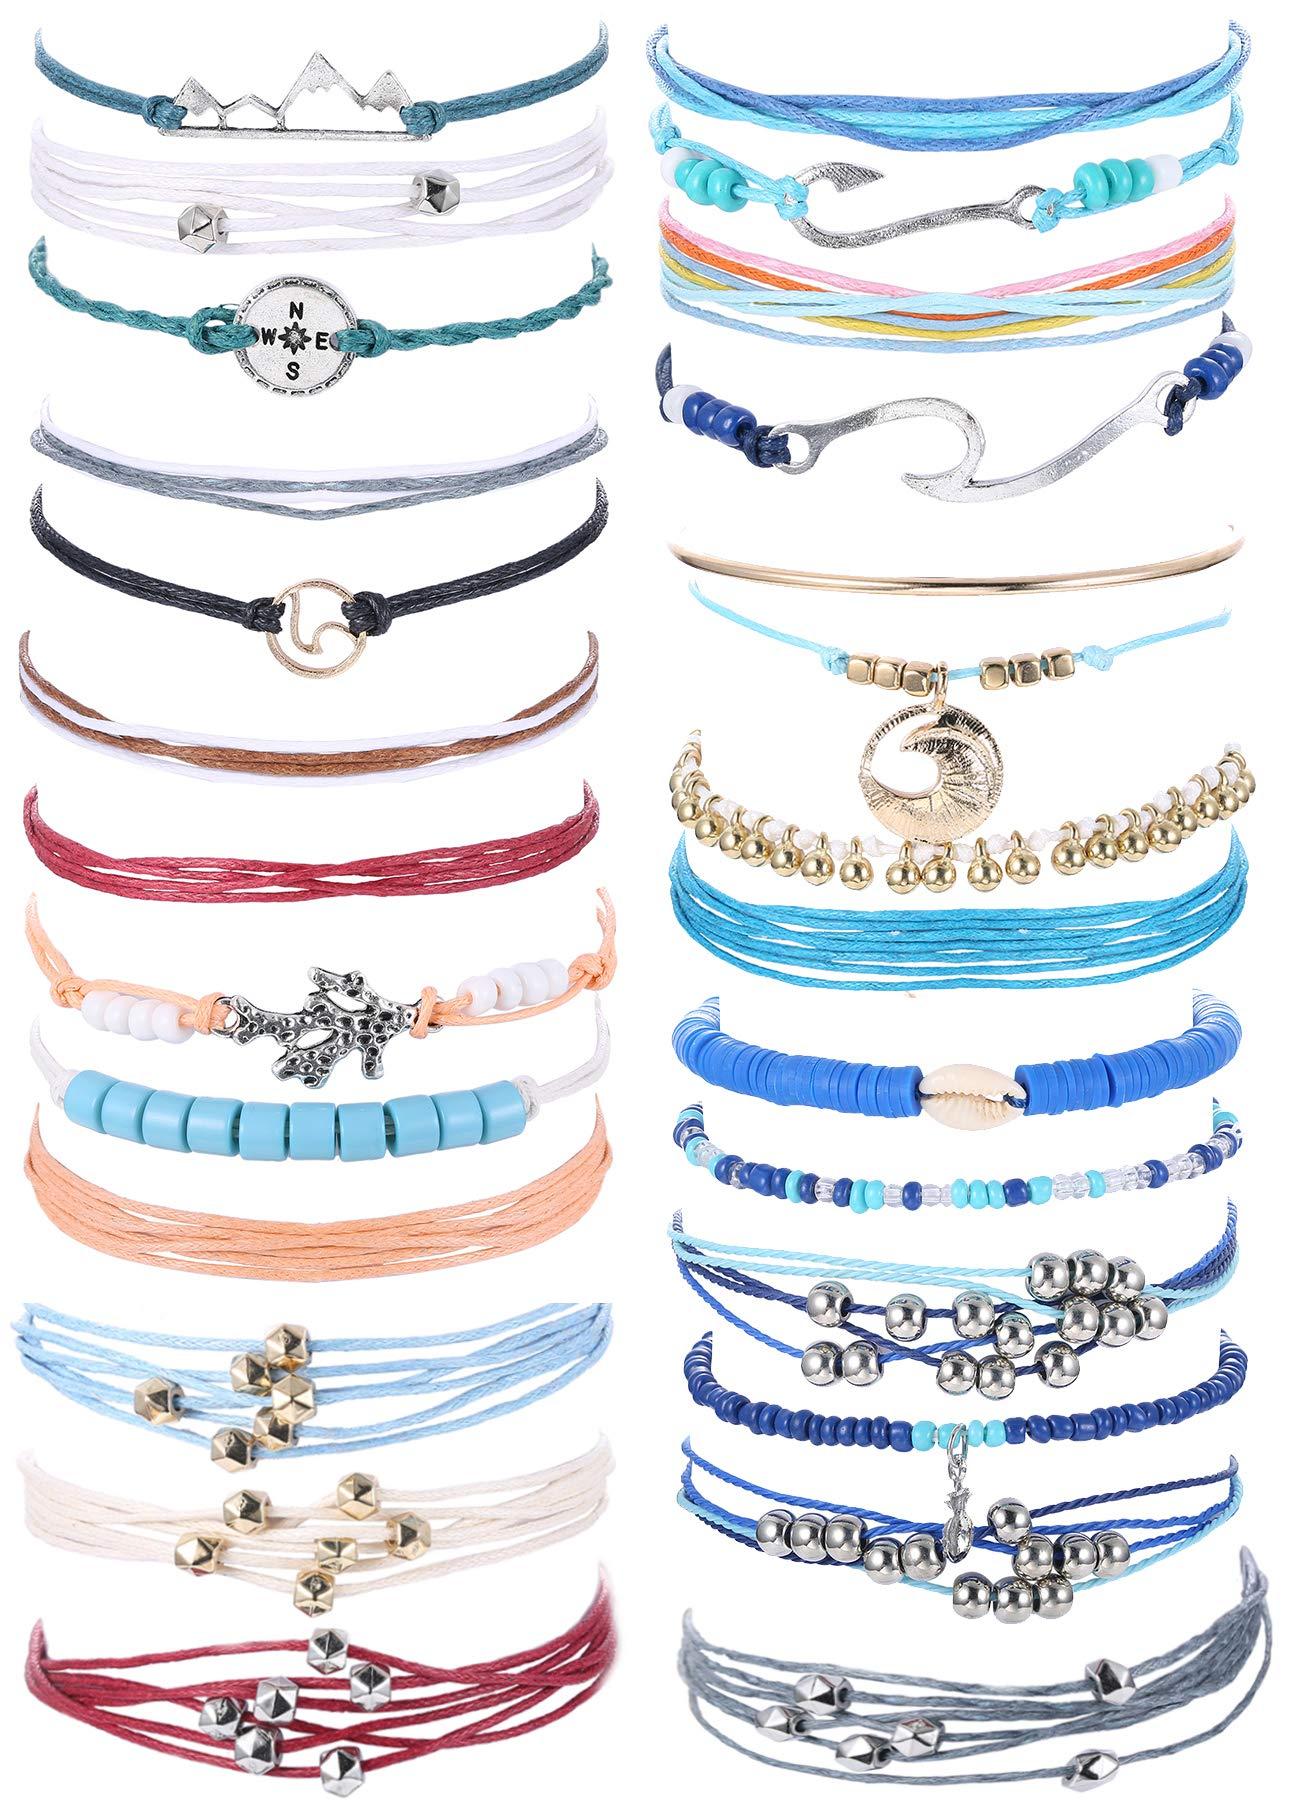 Subiceto 7 Set Wave Strand Bracelet Set for Women Girls Handmade Wax Coated Braided Rope Boho Woven Bracelet by Subiceto